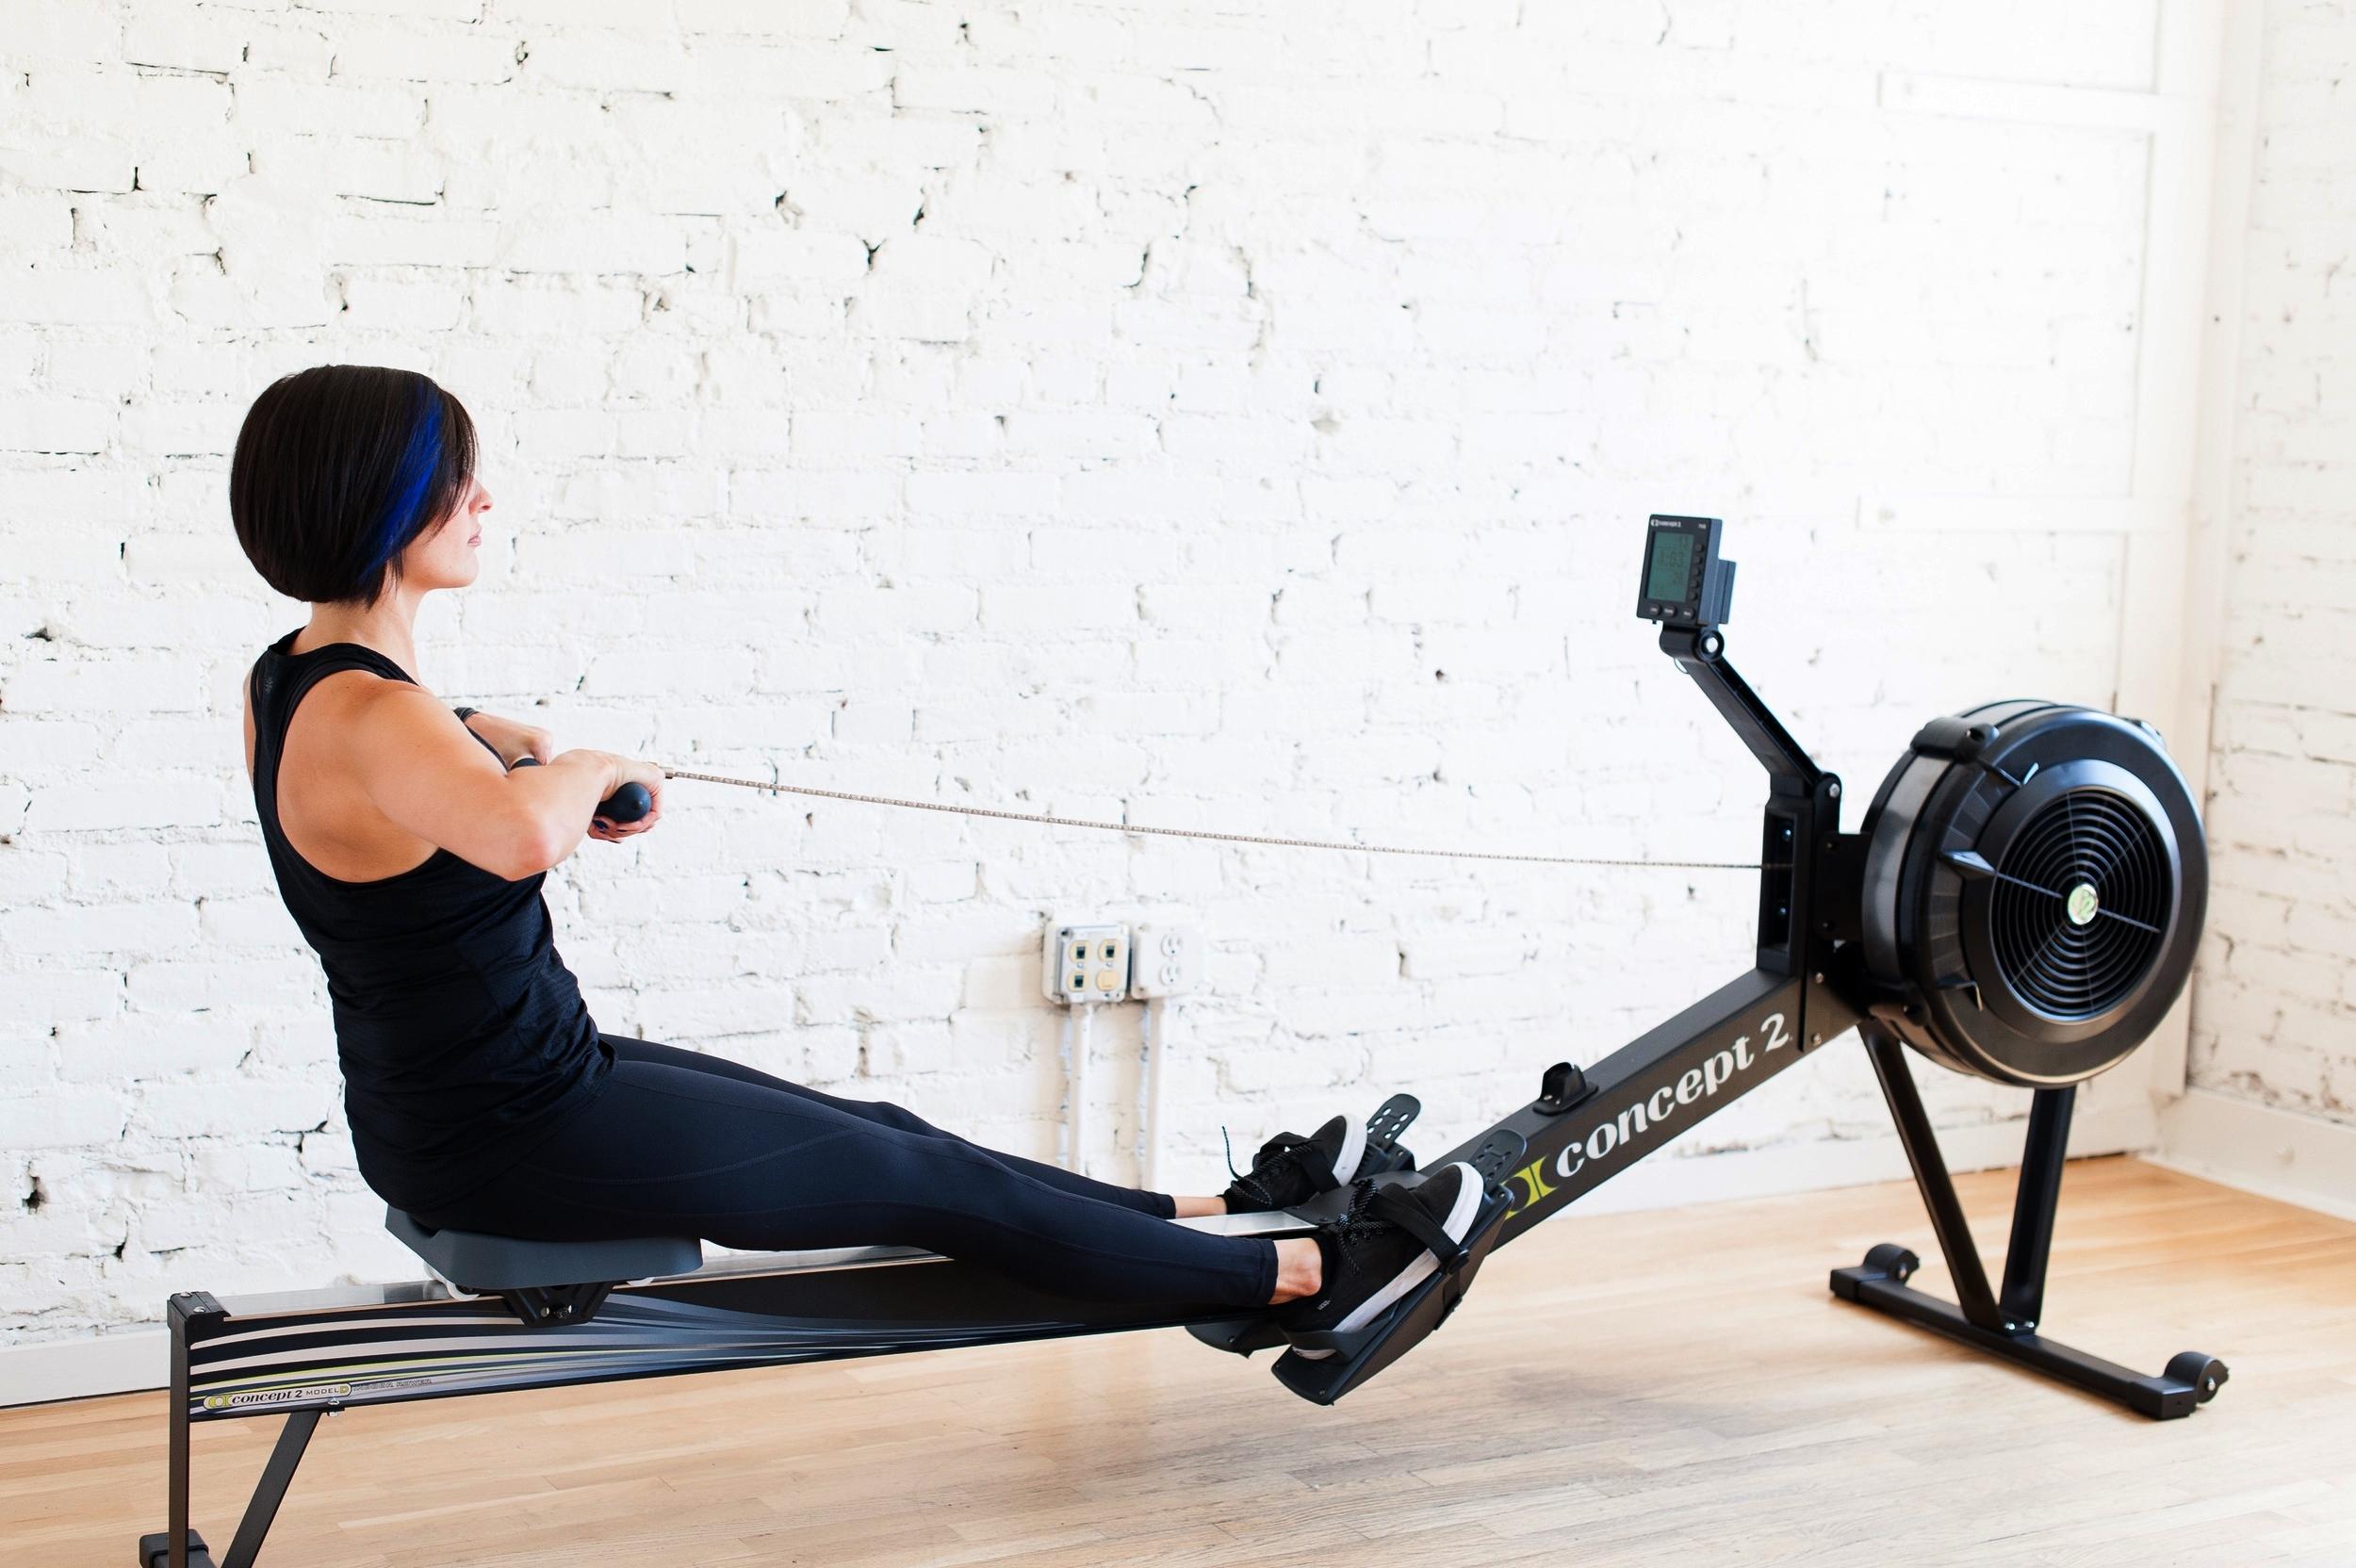 training personal rowing machine rower cardio